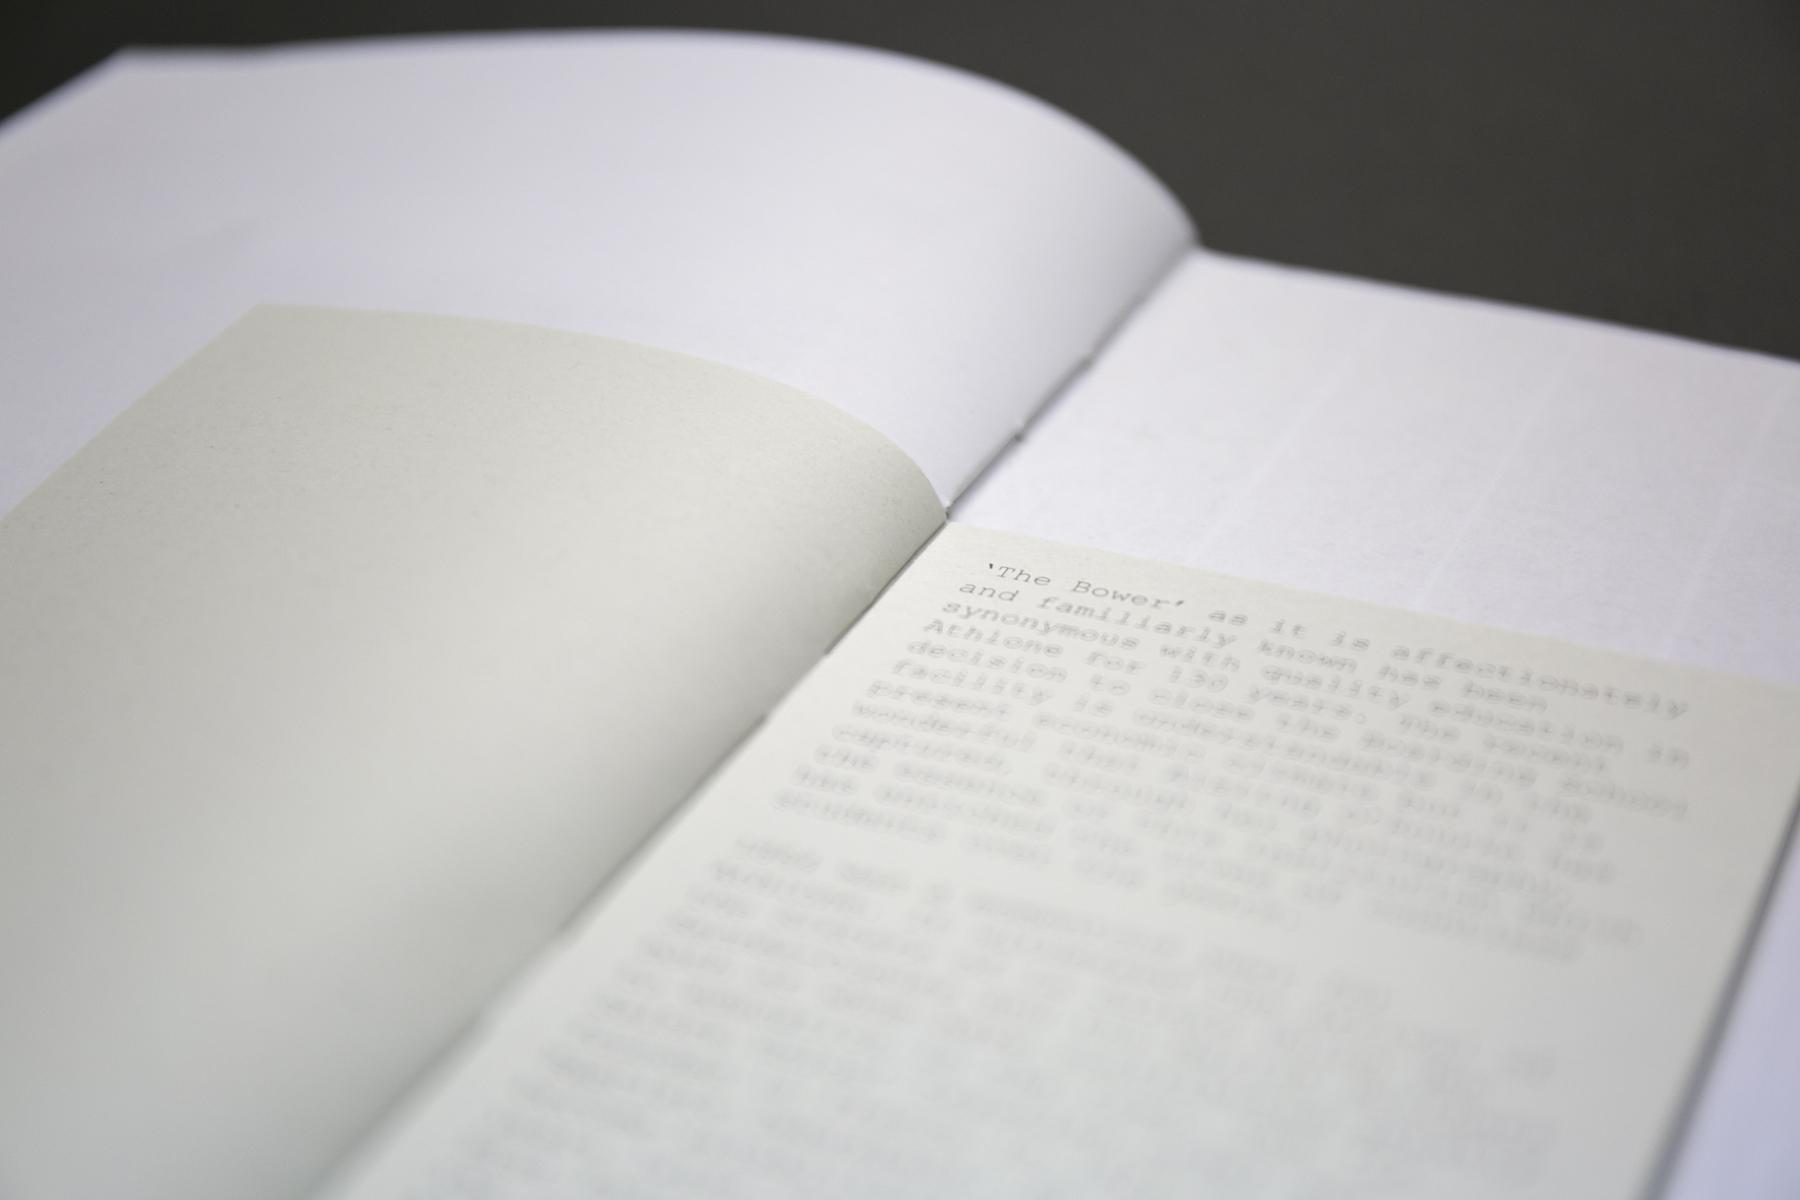 abowerforsisters-book-25.jpg